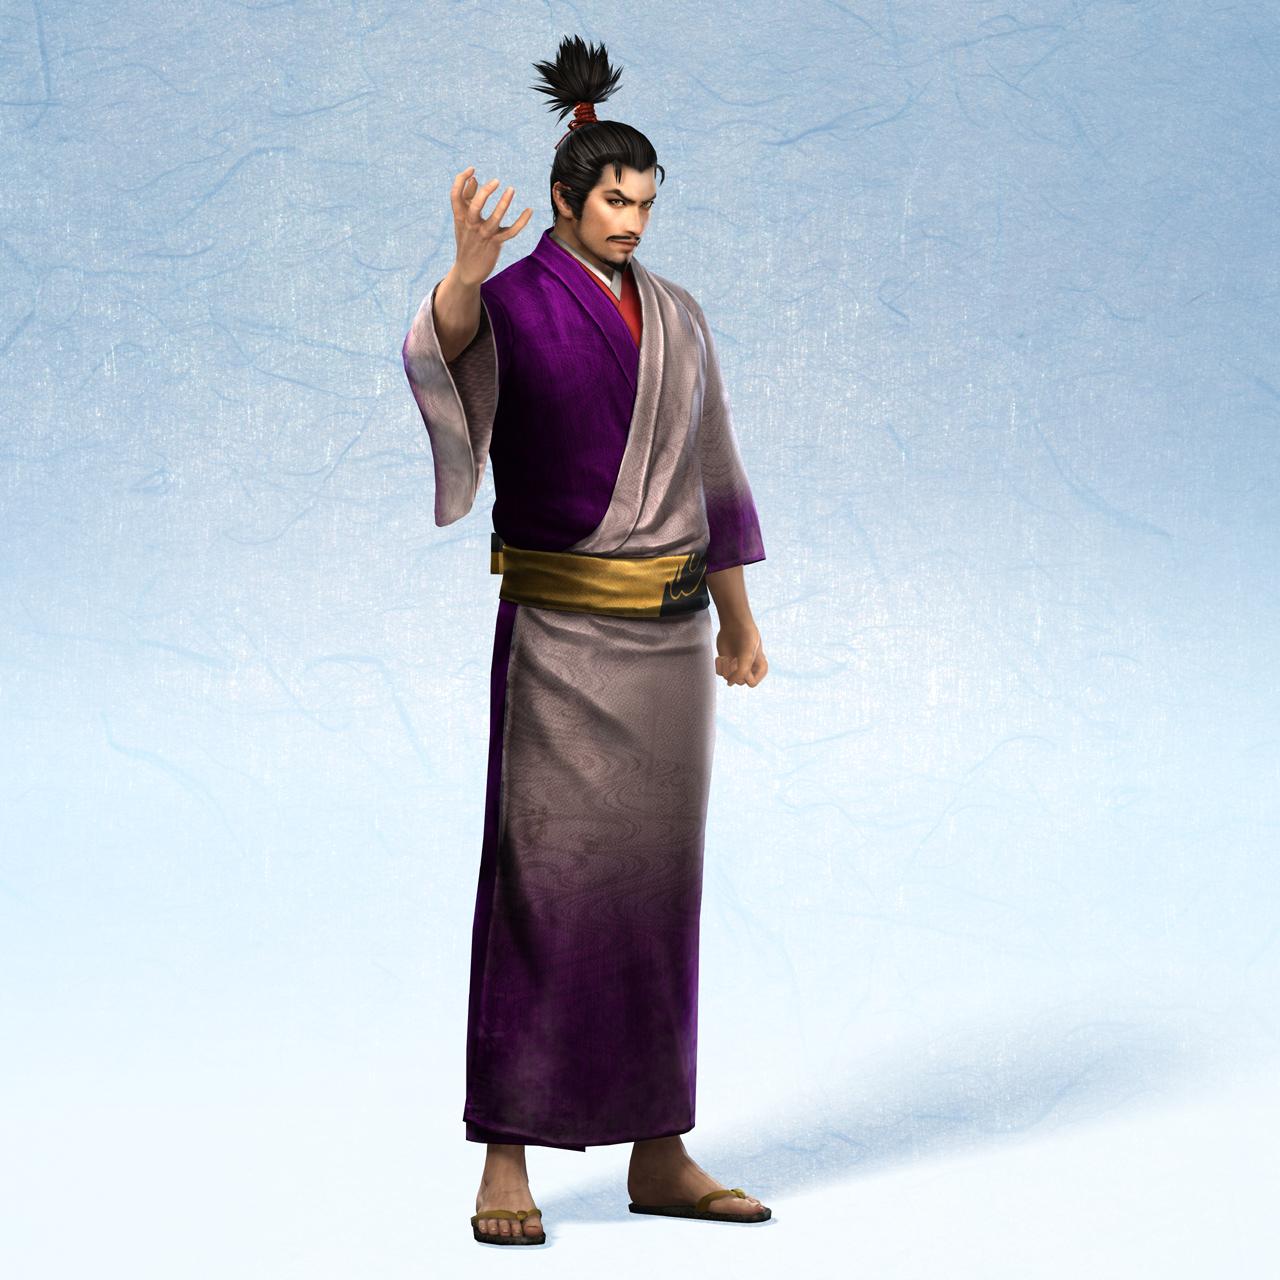 Warriors Orochi 3 Ultimate Nobunaga Oda: Image - Nobunaga Oda Yukata Costume (SW4E DLC).jpg